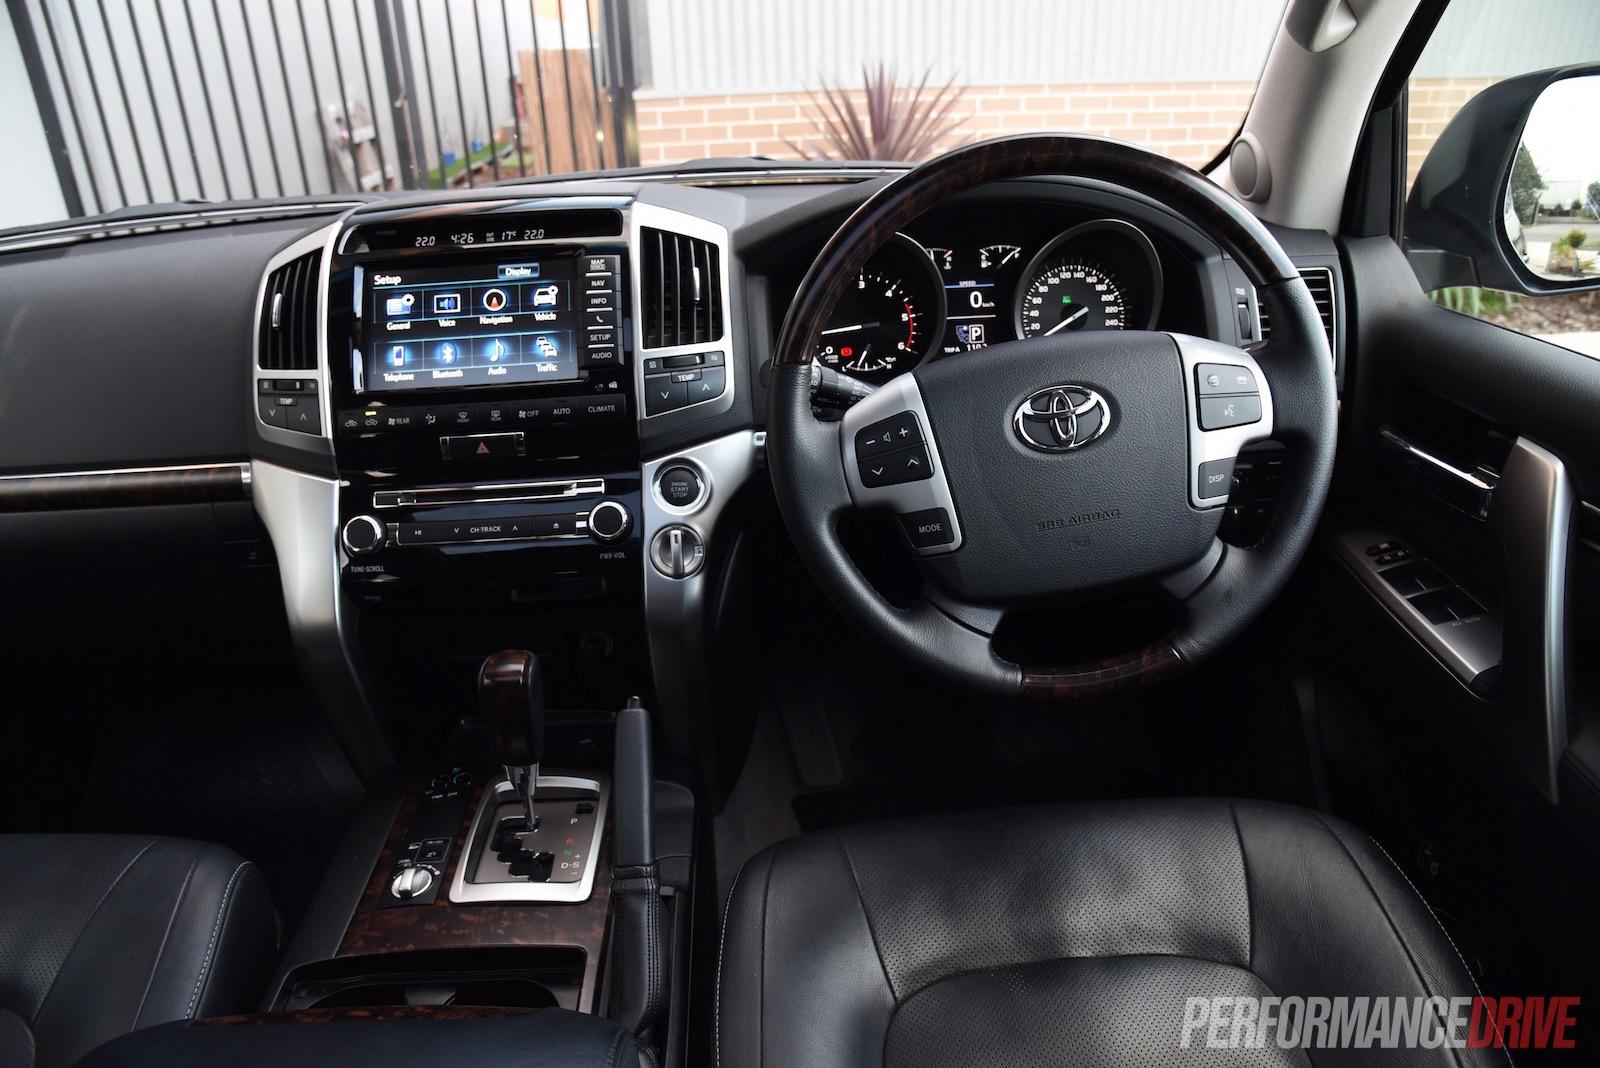 2015 toyota landcruiser sahara diesel review video